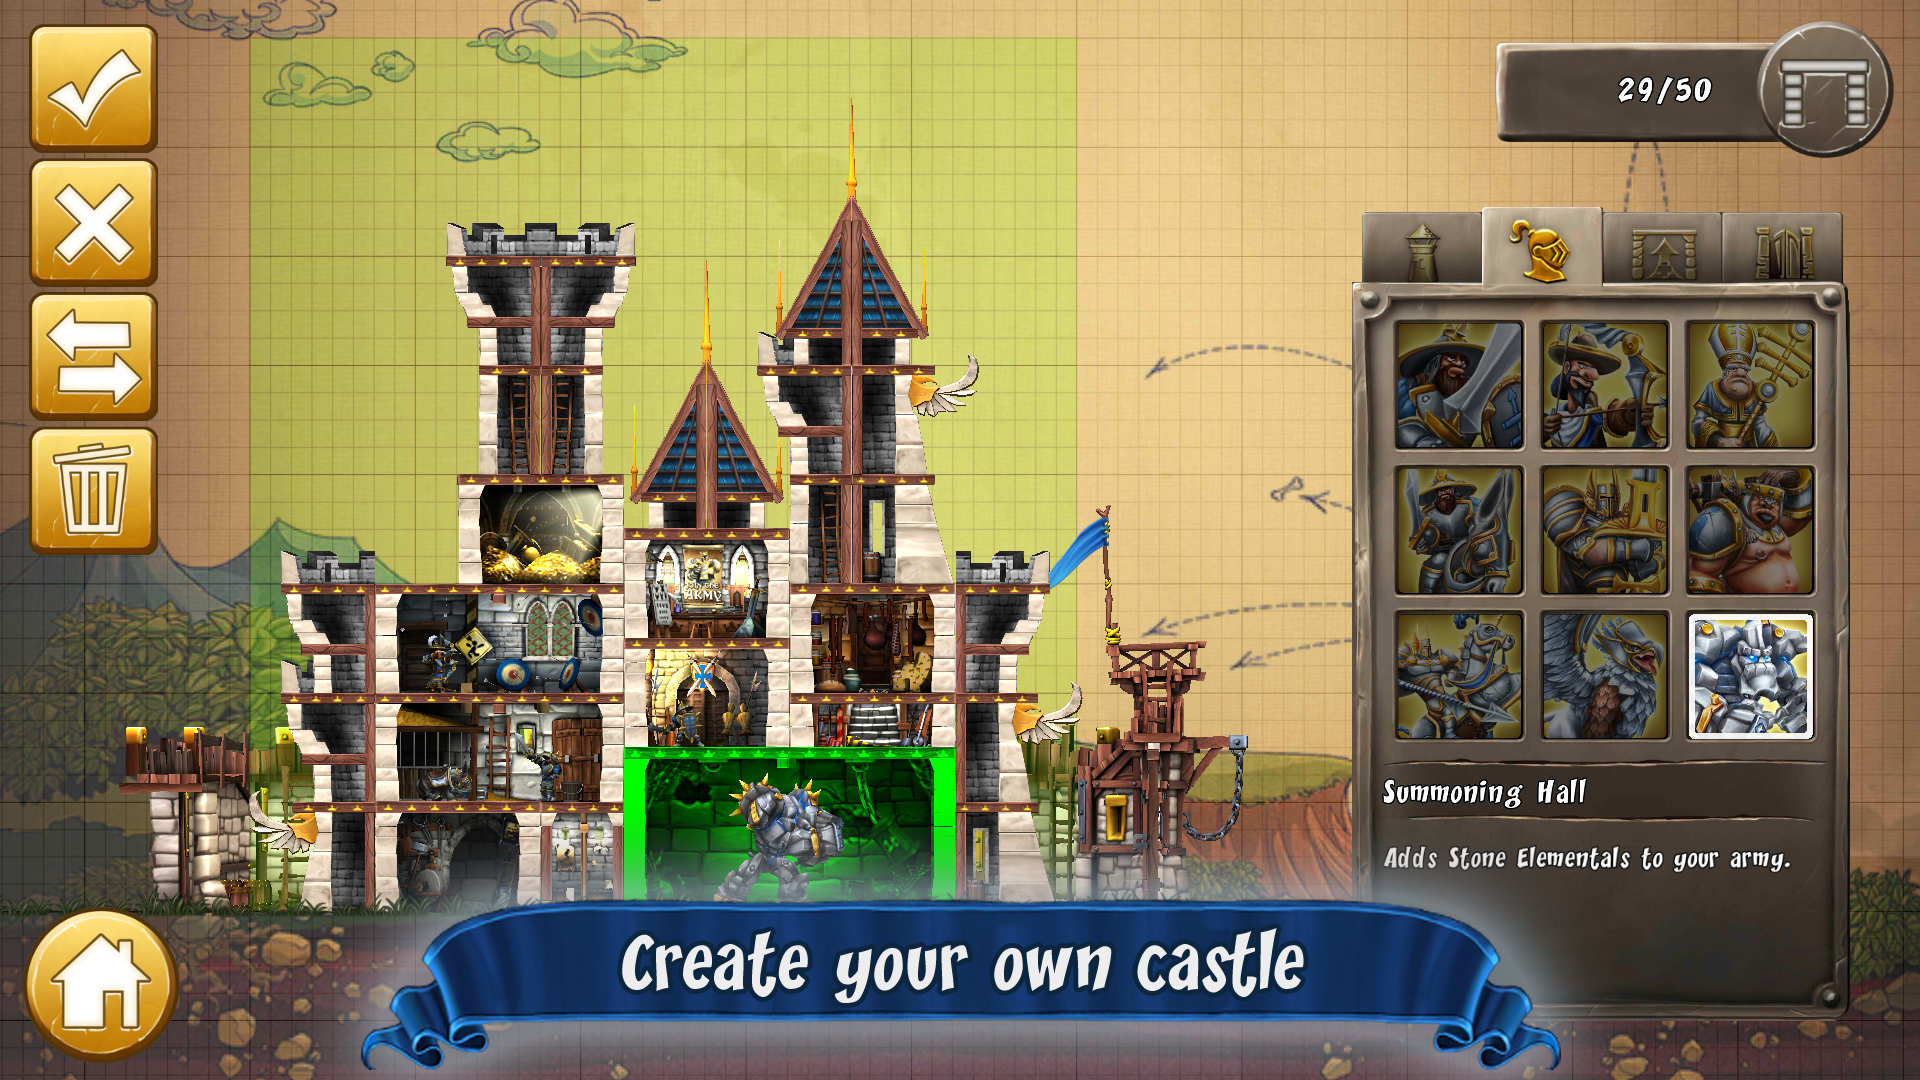 CastleStorm - Free to Siege screenshot #19